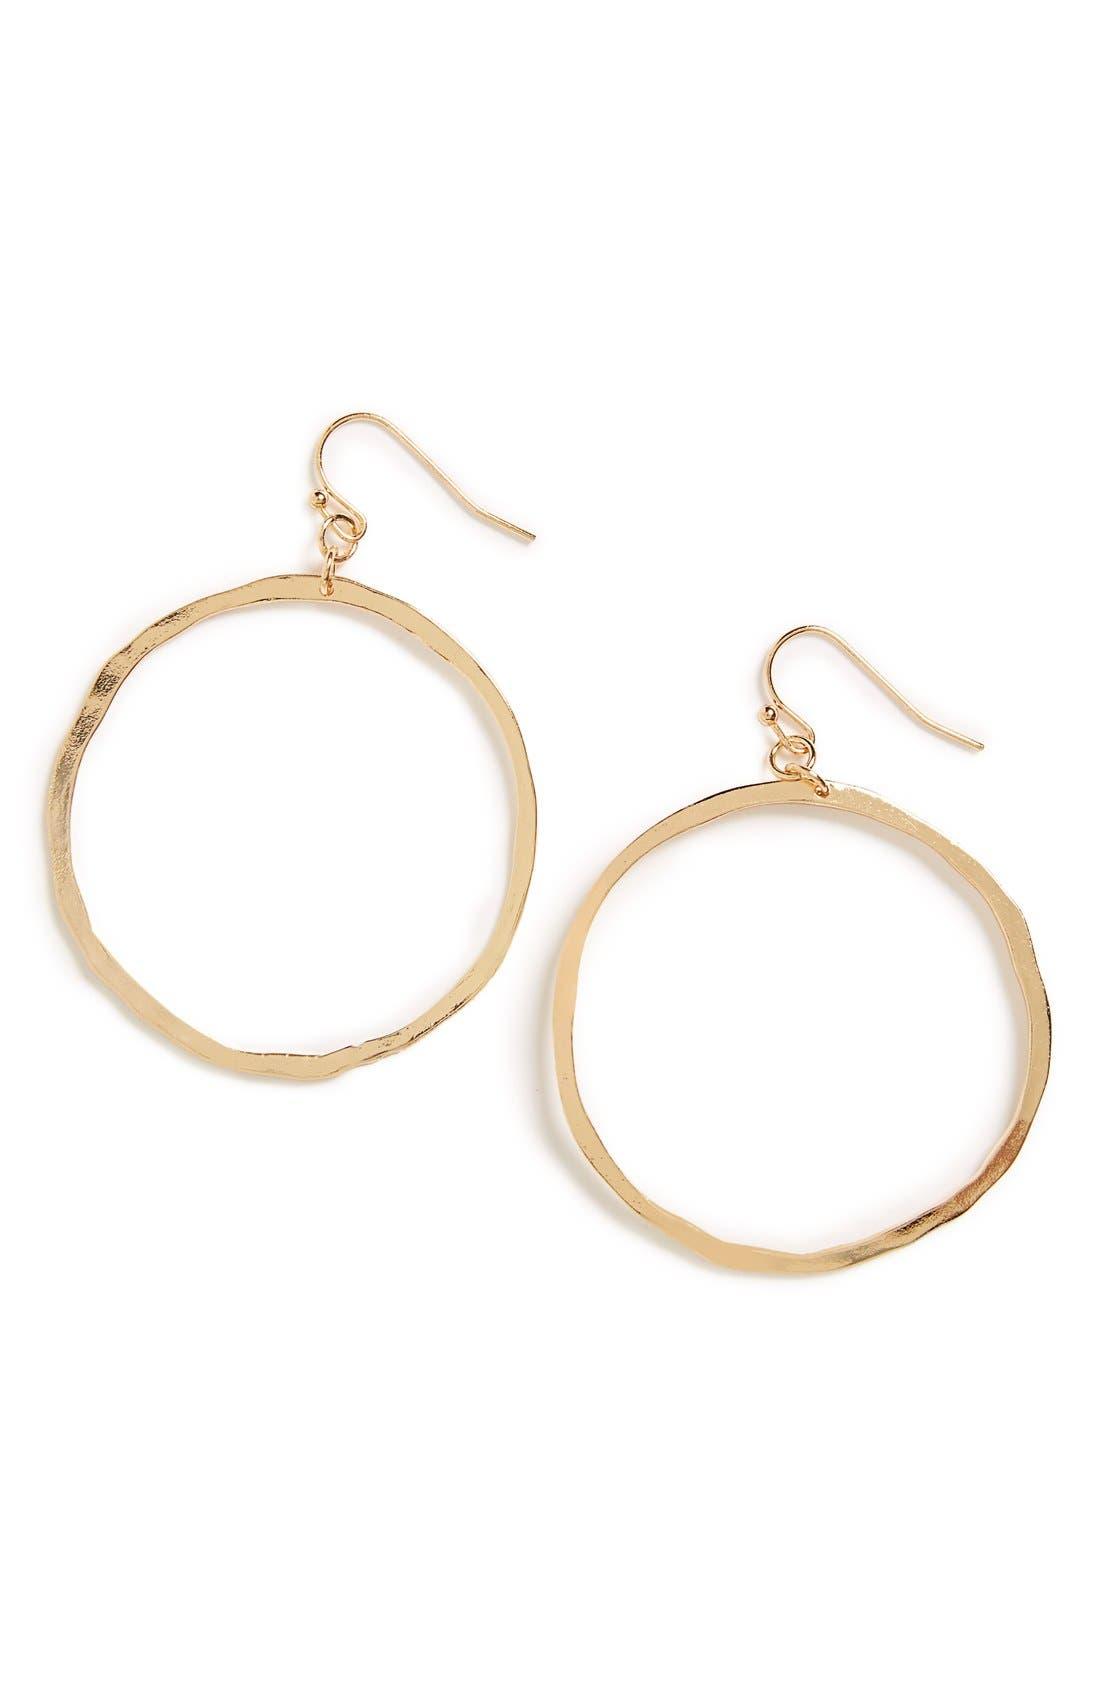 Main Image - BP. Hammered Circle Earrings